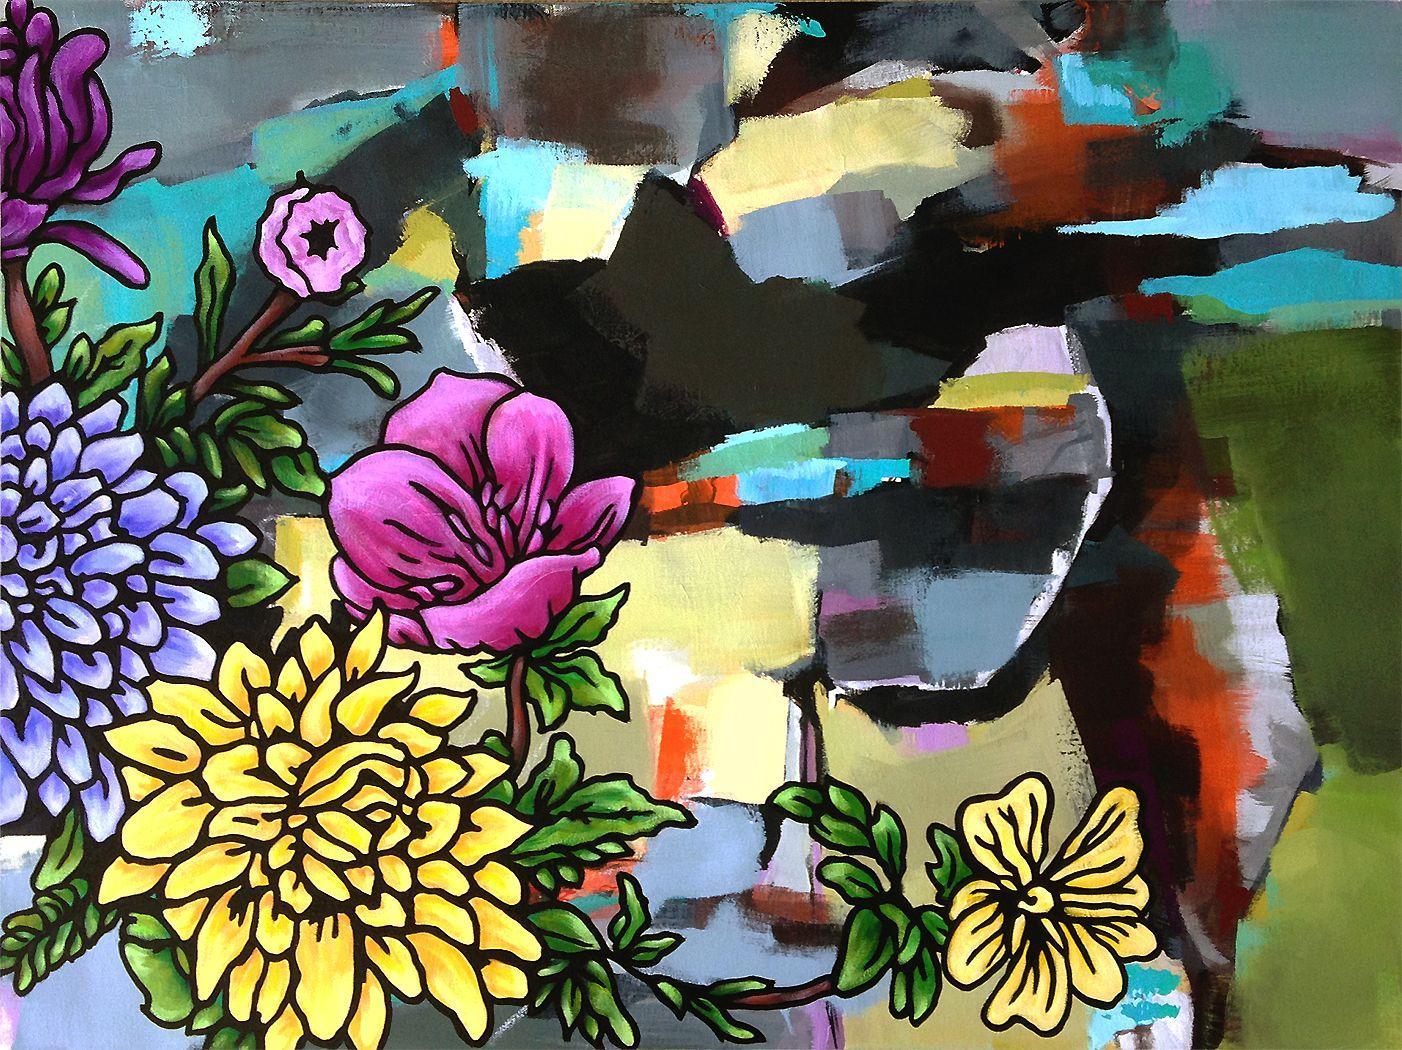 Desert Rose, Painting, Acrylic on Canvas